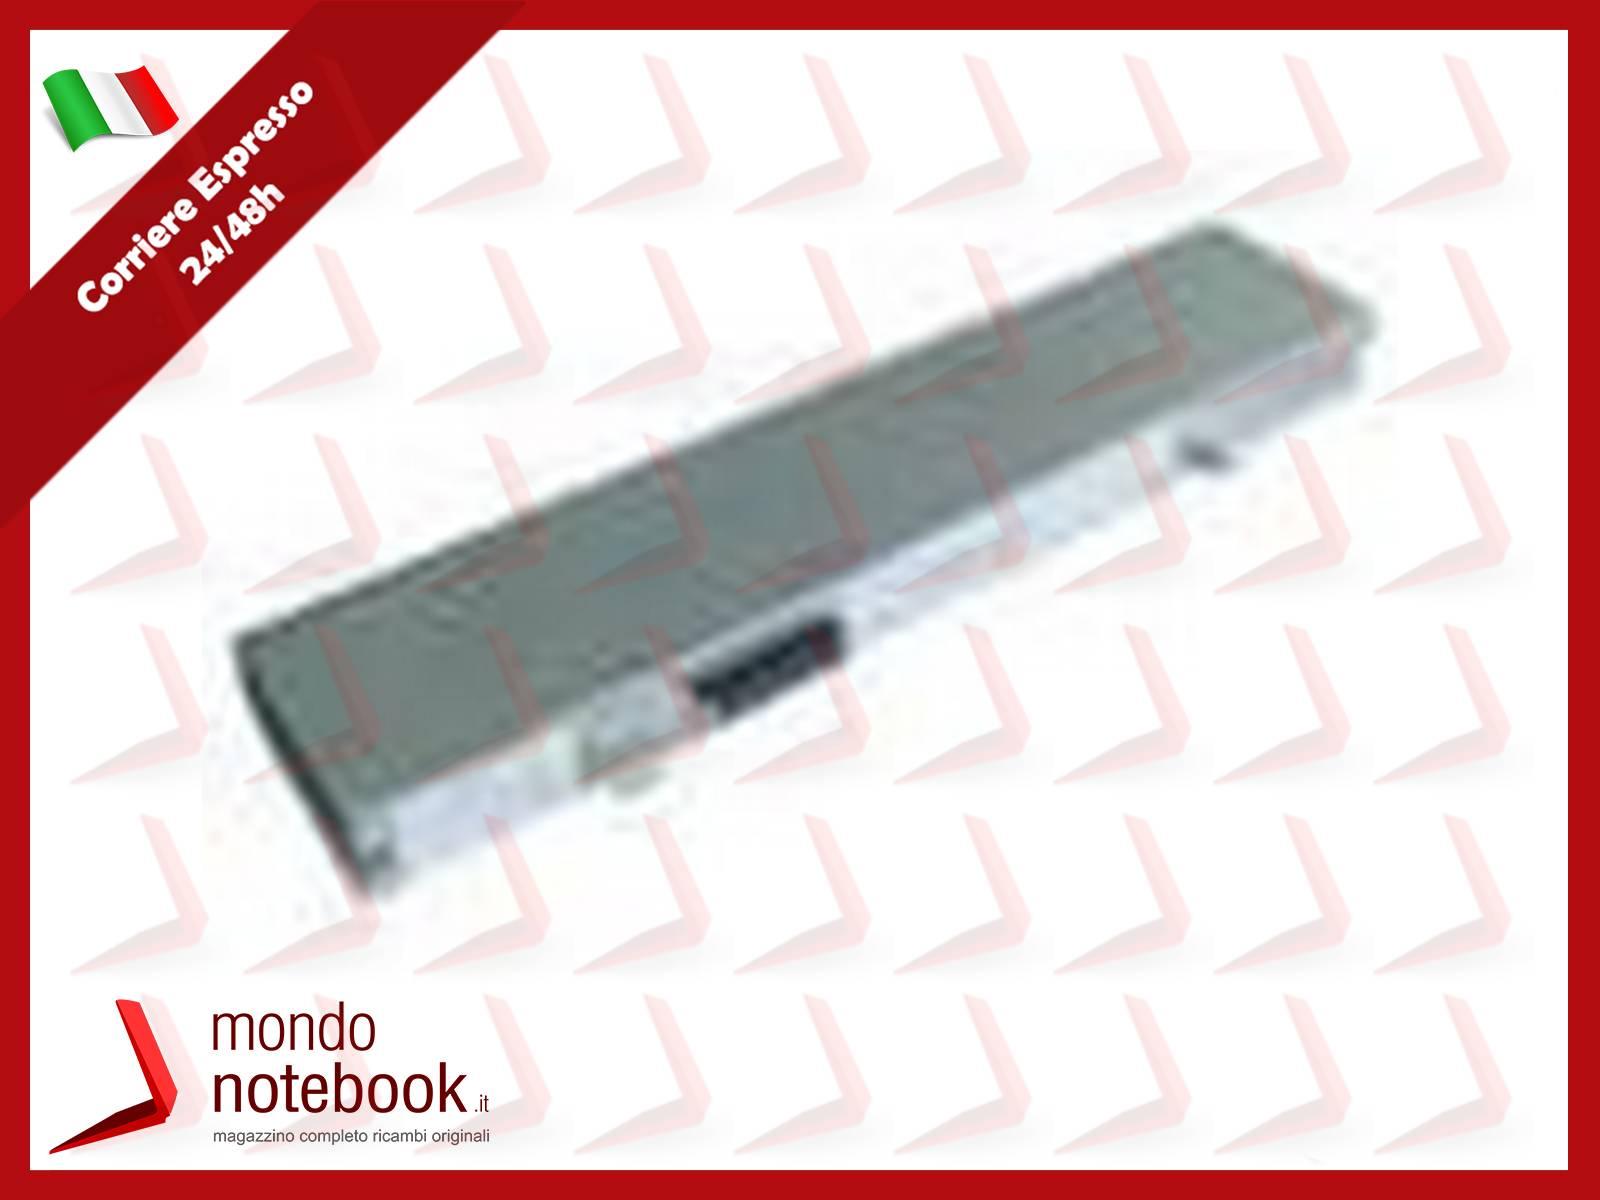 https://www.mondonotebook.it/13332/connettore-di-alimentazione-dc-power-jack-pj086-fujitsu-lifebook-ah530-ah531-165-cm.jpg